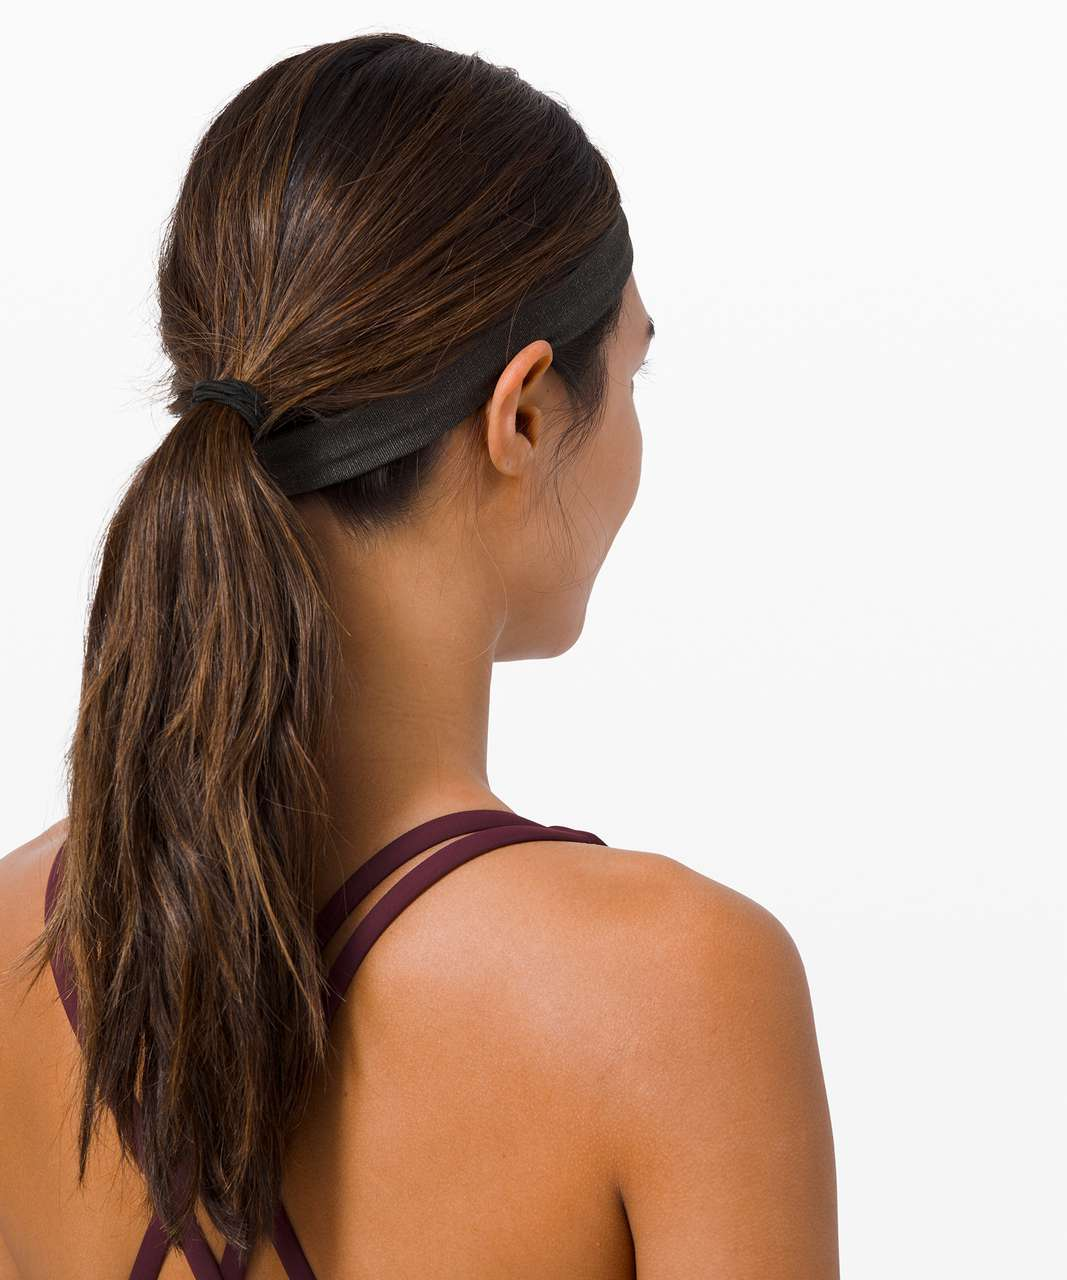 Lululemon Cardio Cross Trainer Headband - Graphite Grey / Vapor